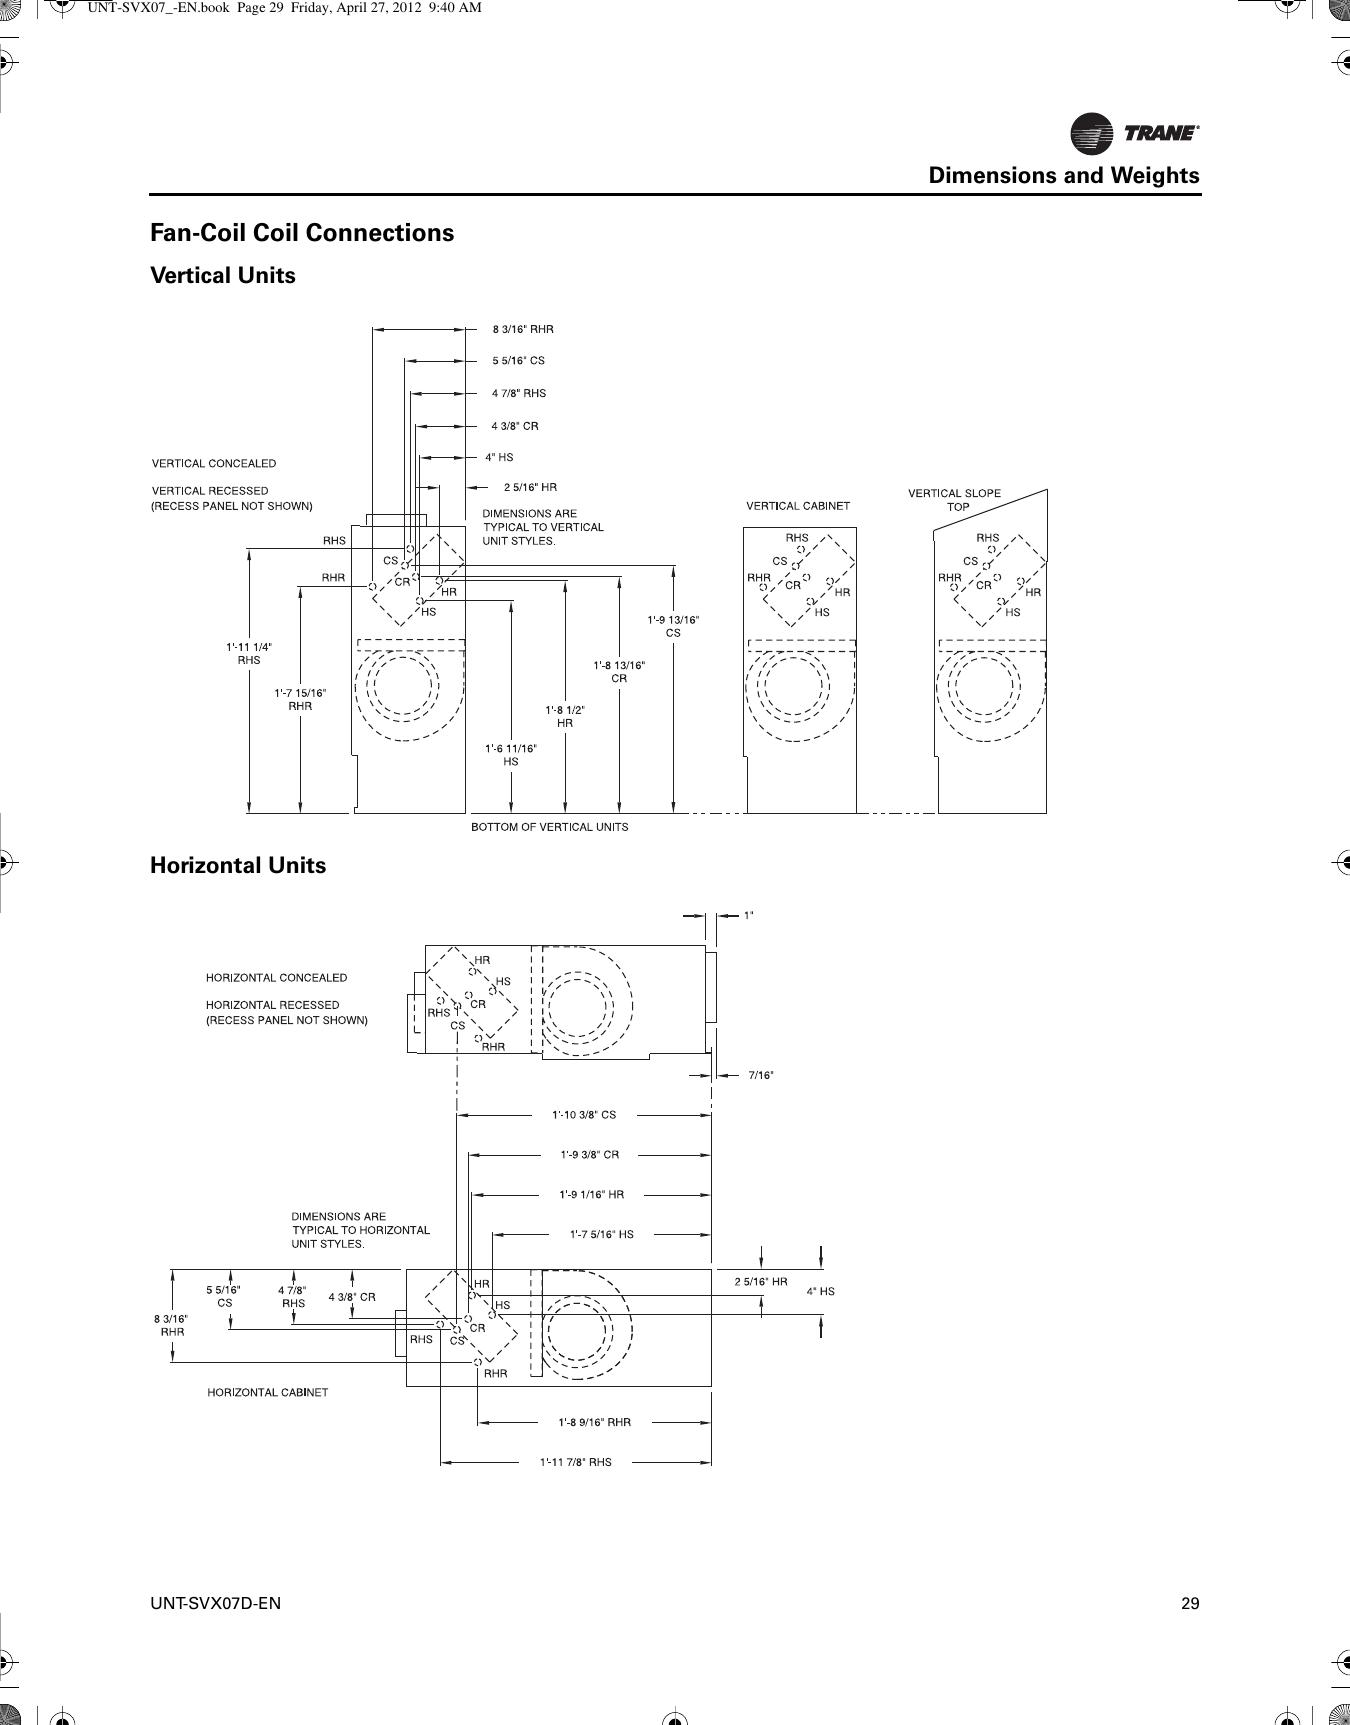 Page 29 of 138 trane trane uni fan coil and